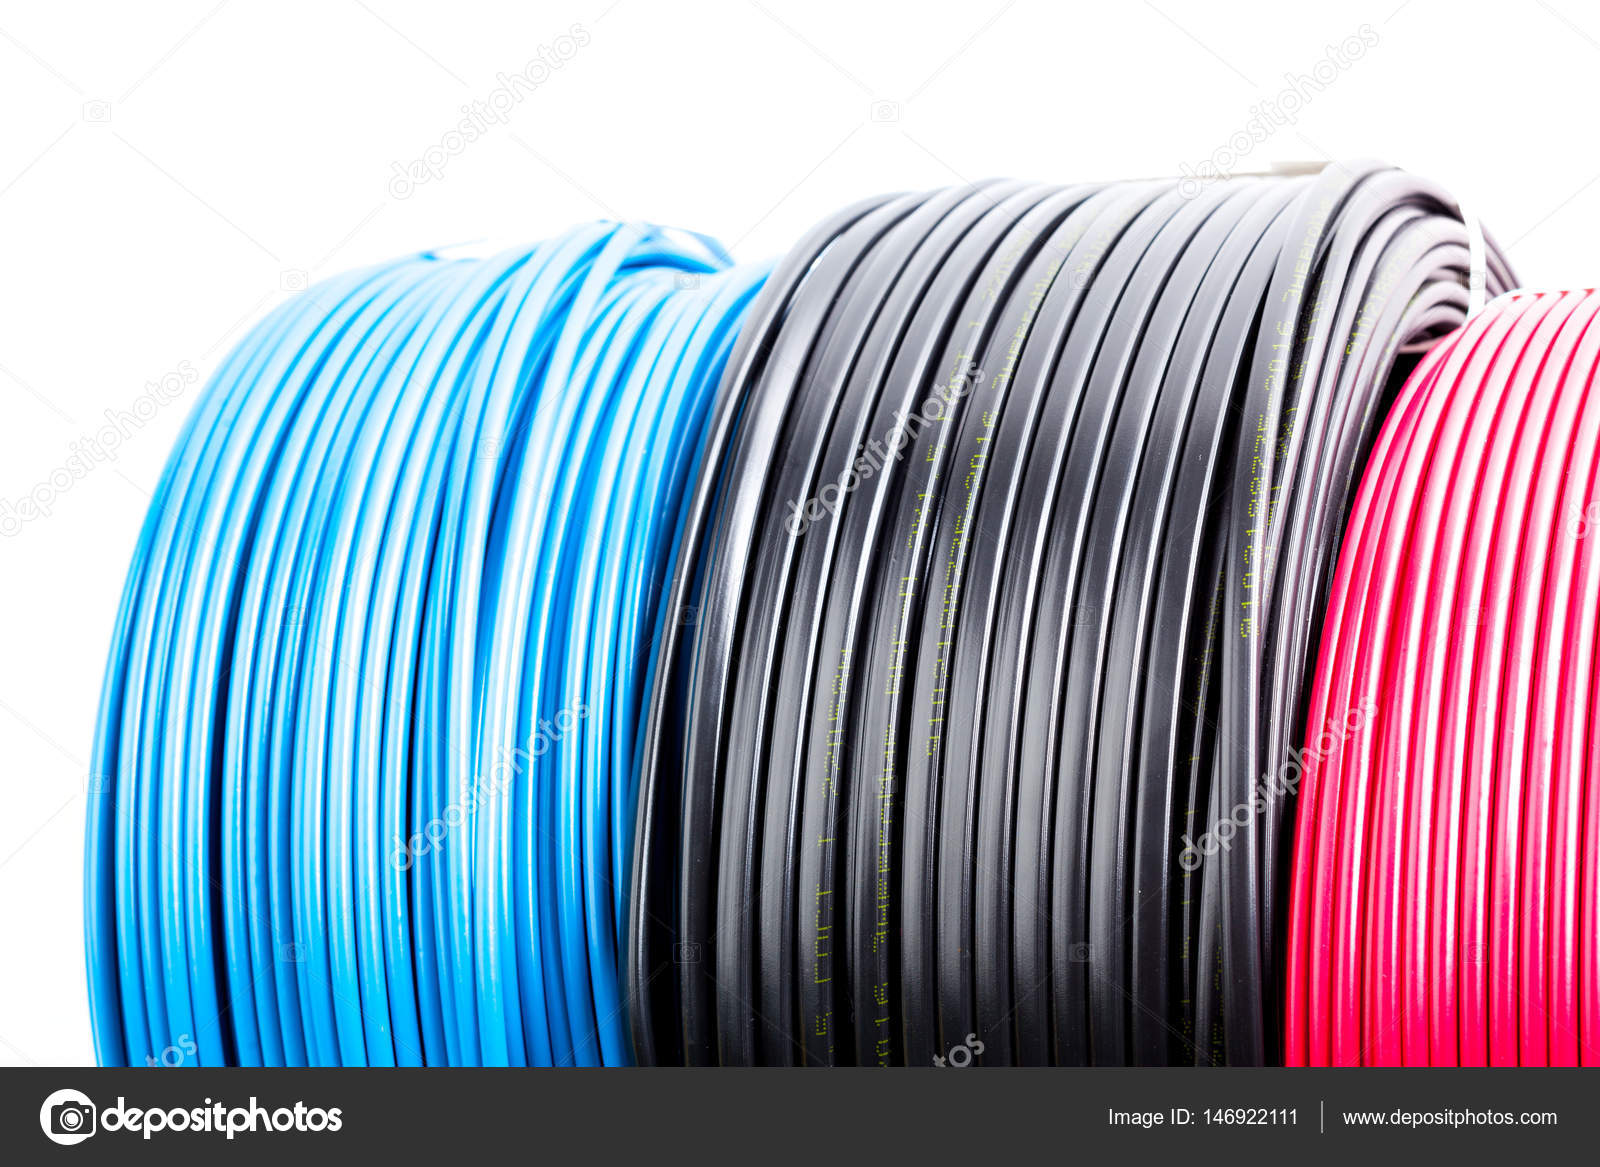 Farbige Elektrokabel farbige kabel stockfoto fotofabrika 146922111